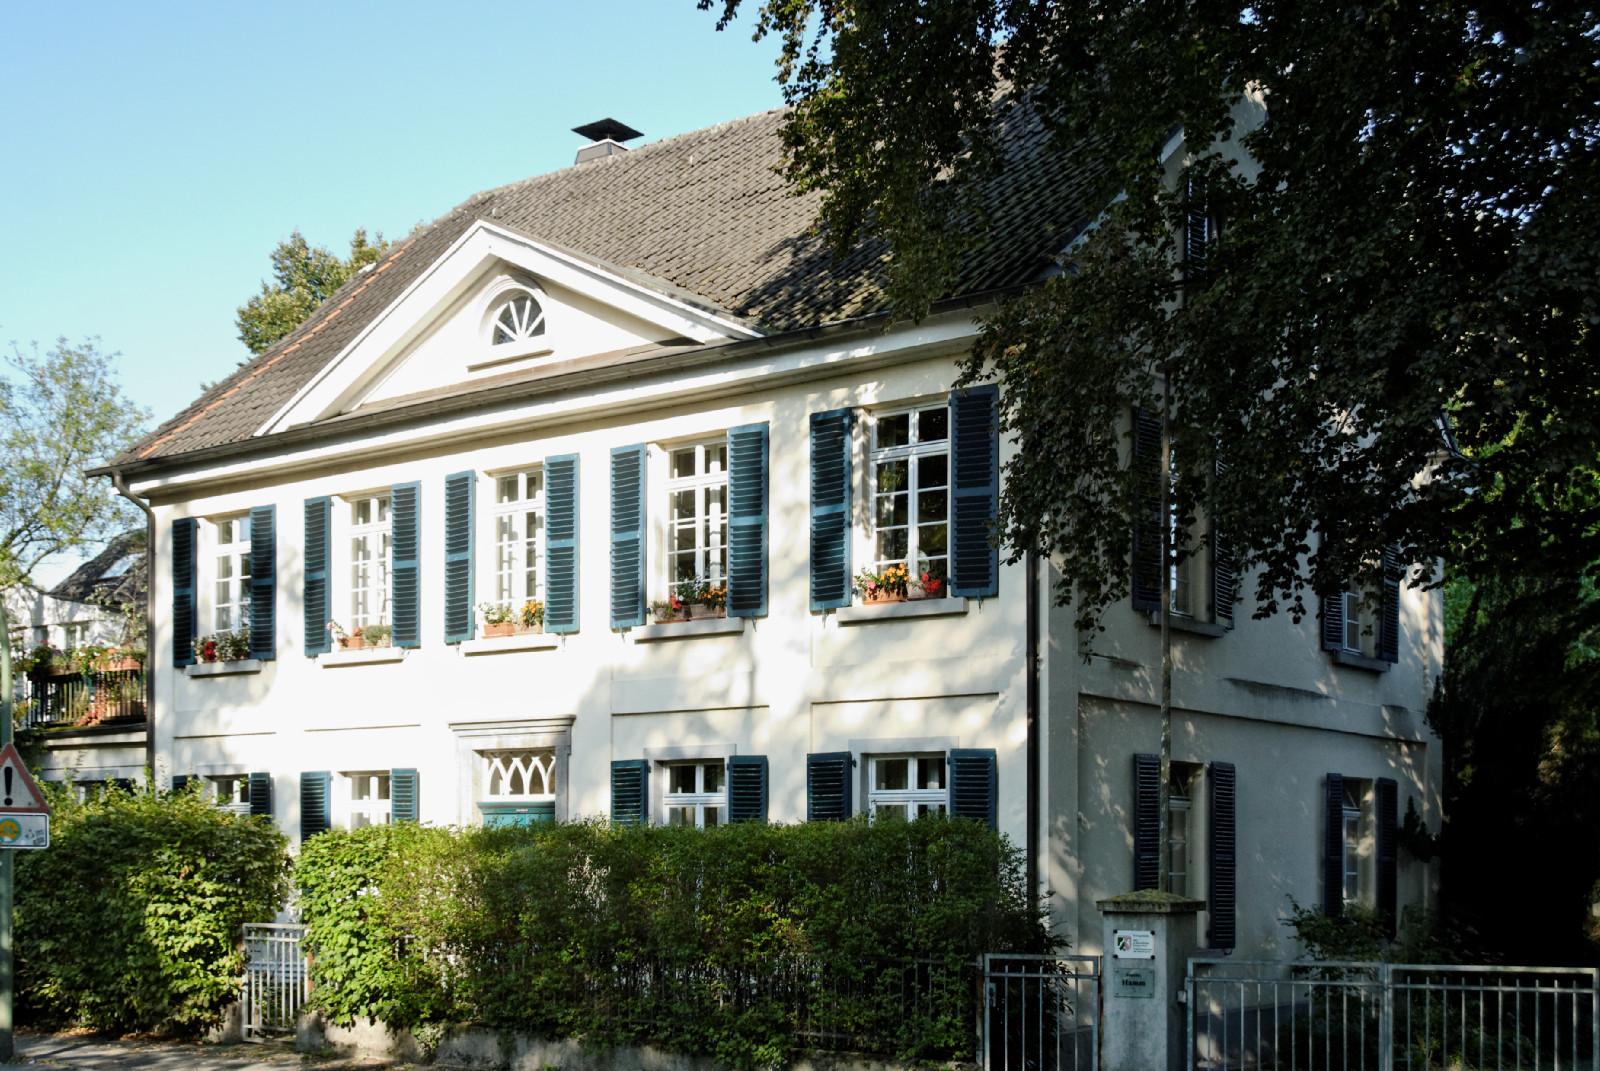 file haus urdenbacher allee 25 in duesseldorf benrath von wikimedia commons. Black Bedroom Furniture Sets. Home Design Ideas